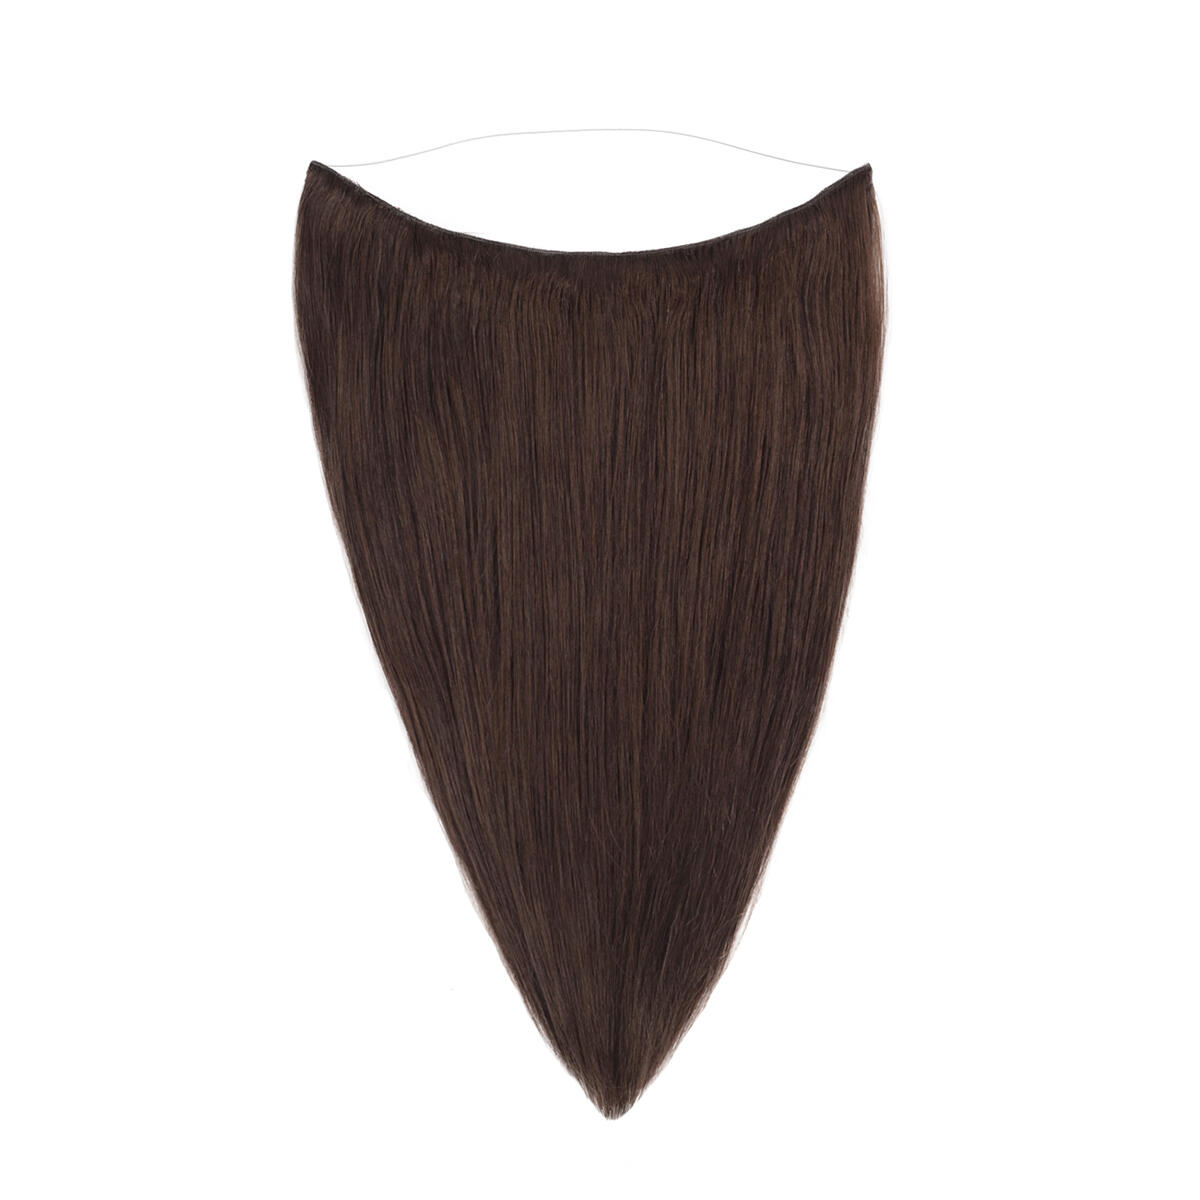 Hairband Original 2.3 Chocolate Brown 45 cm